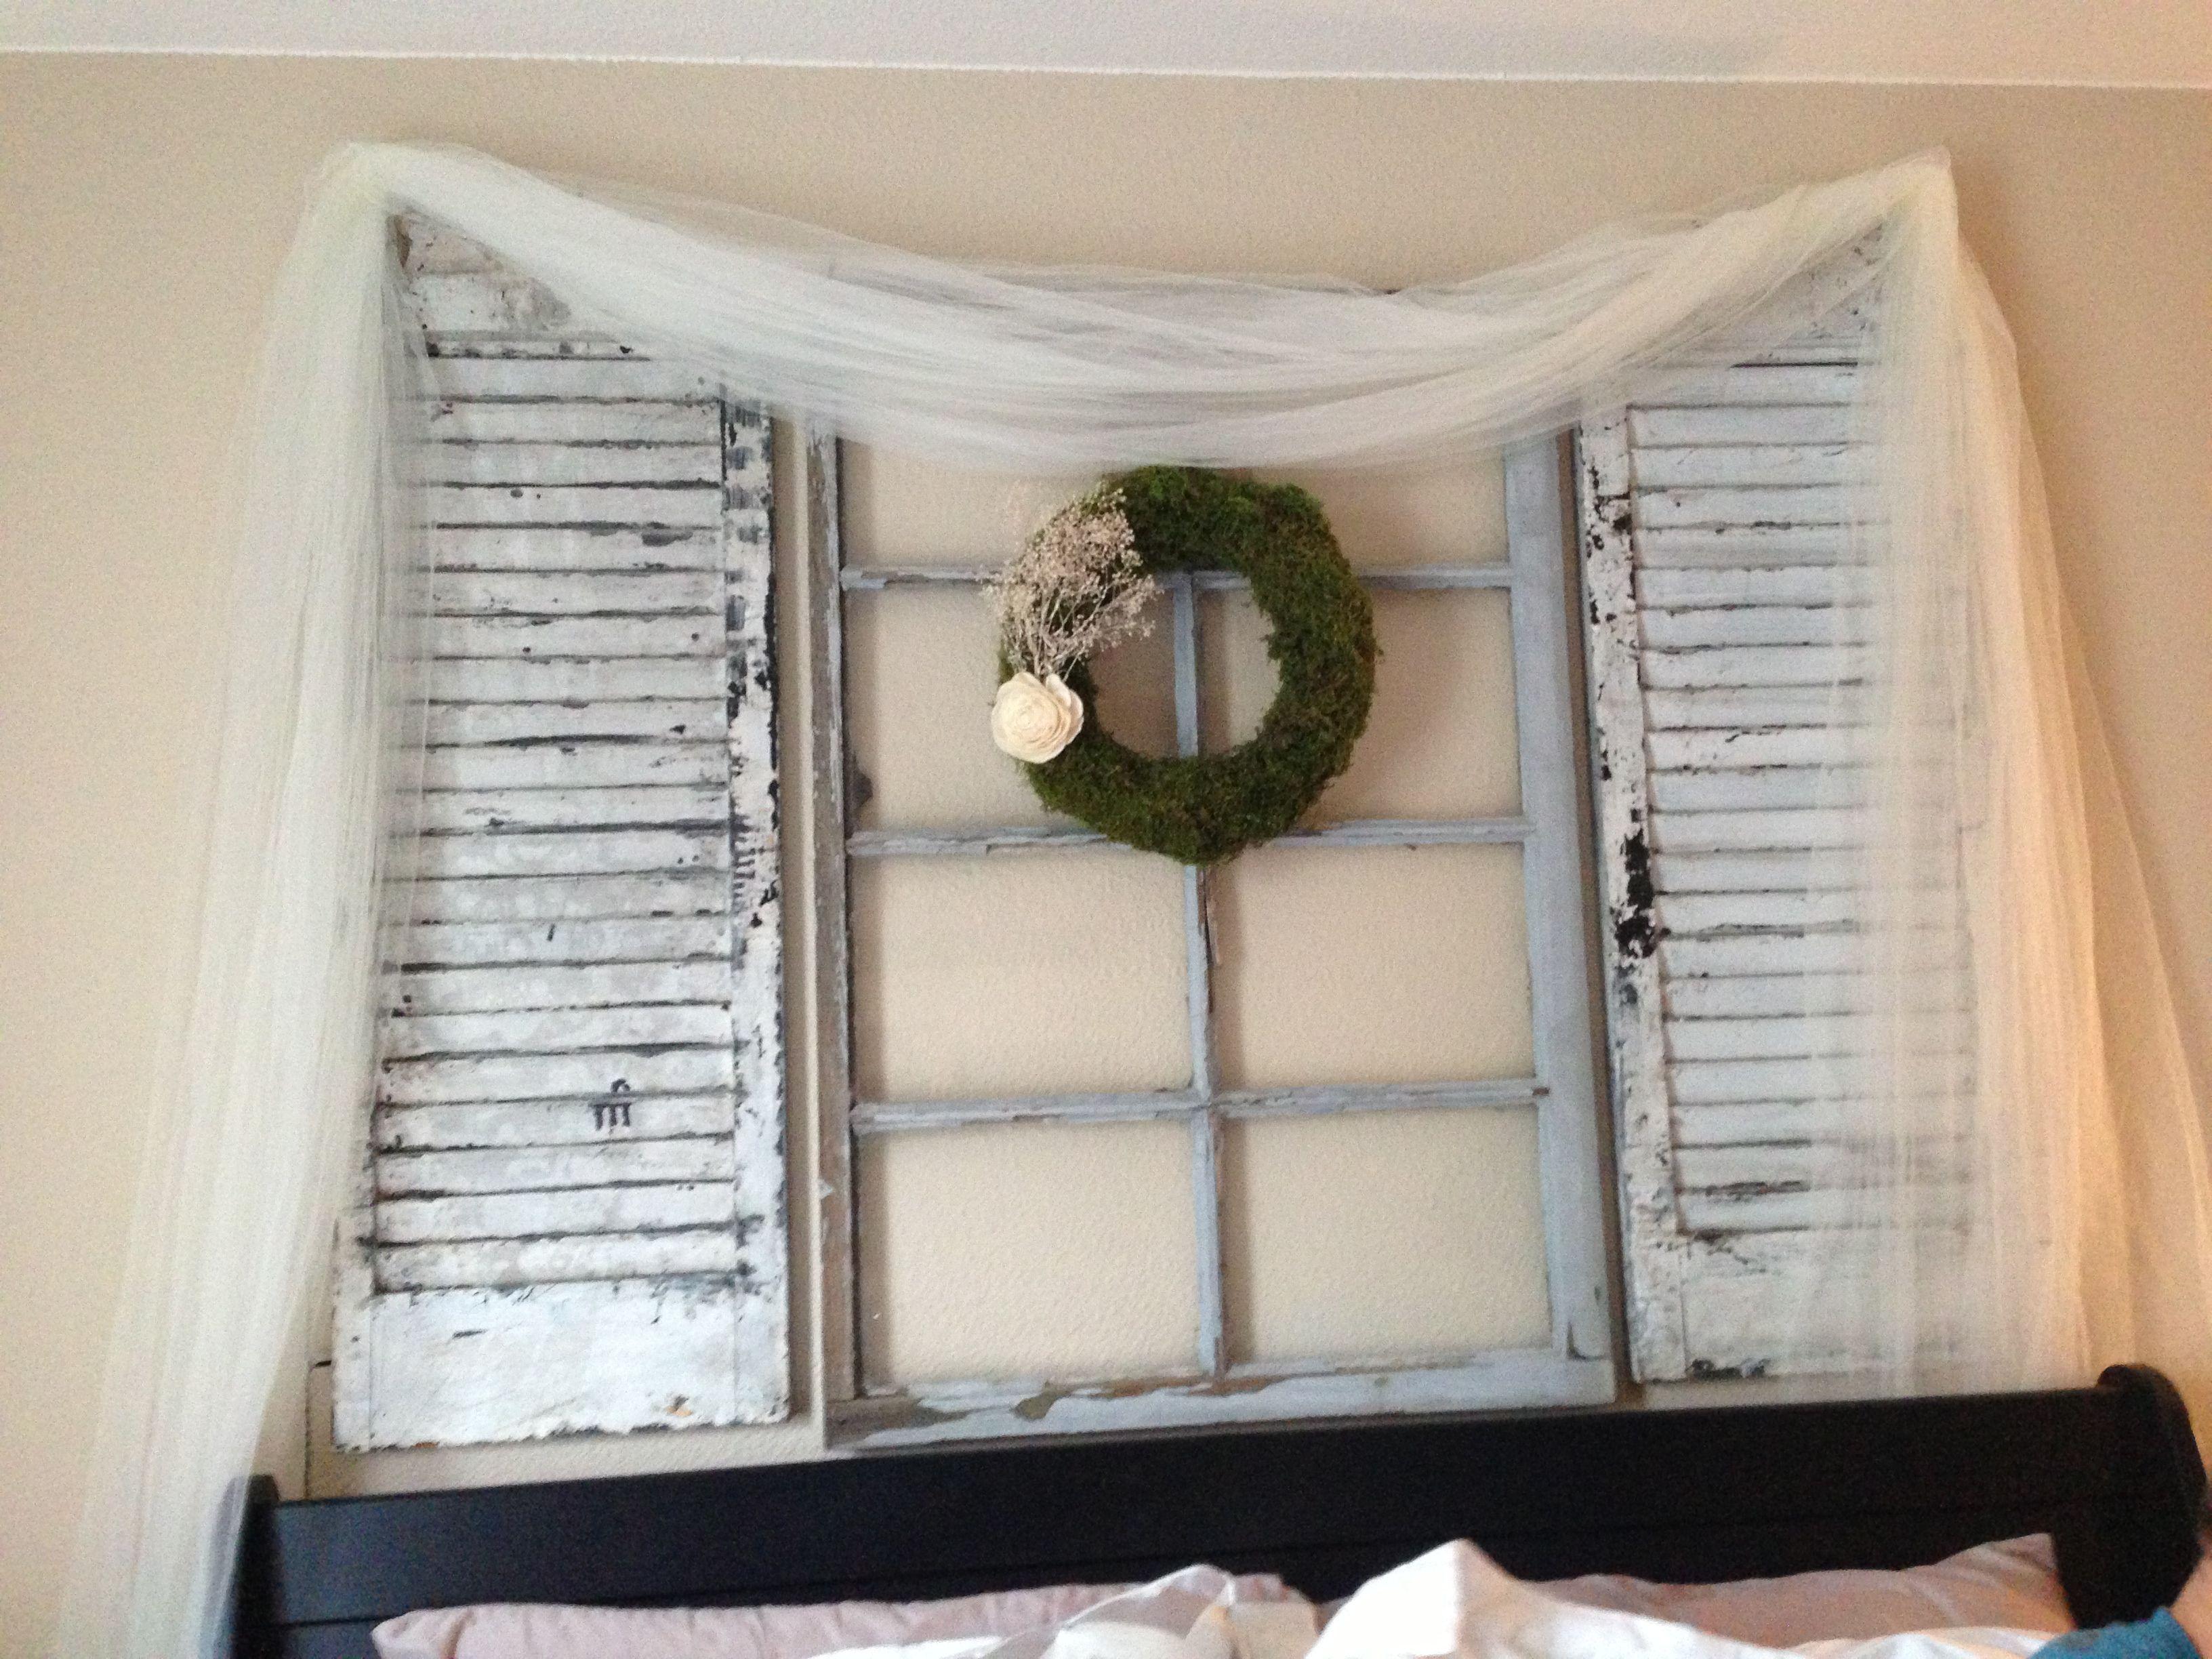 Window decor for bedroom  shabby chic bedroom wall decor tulle moss wreath babyus breath